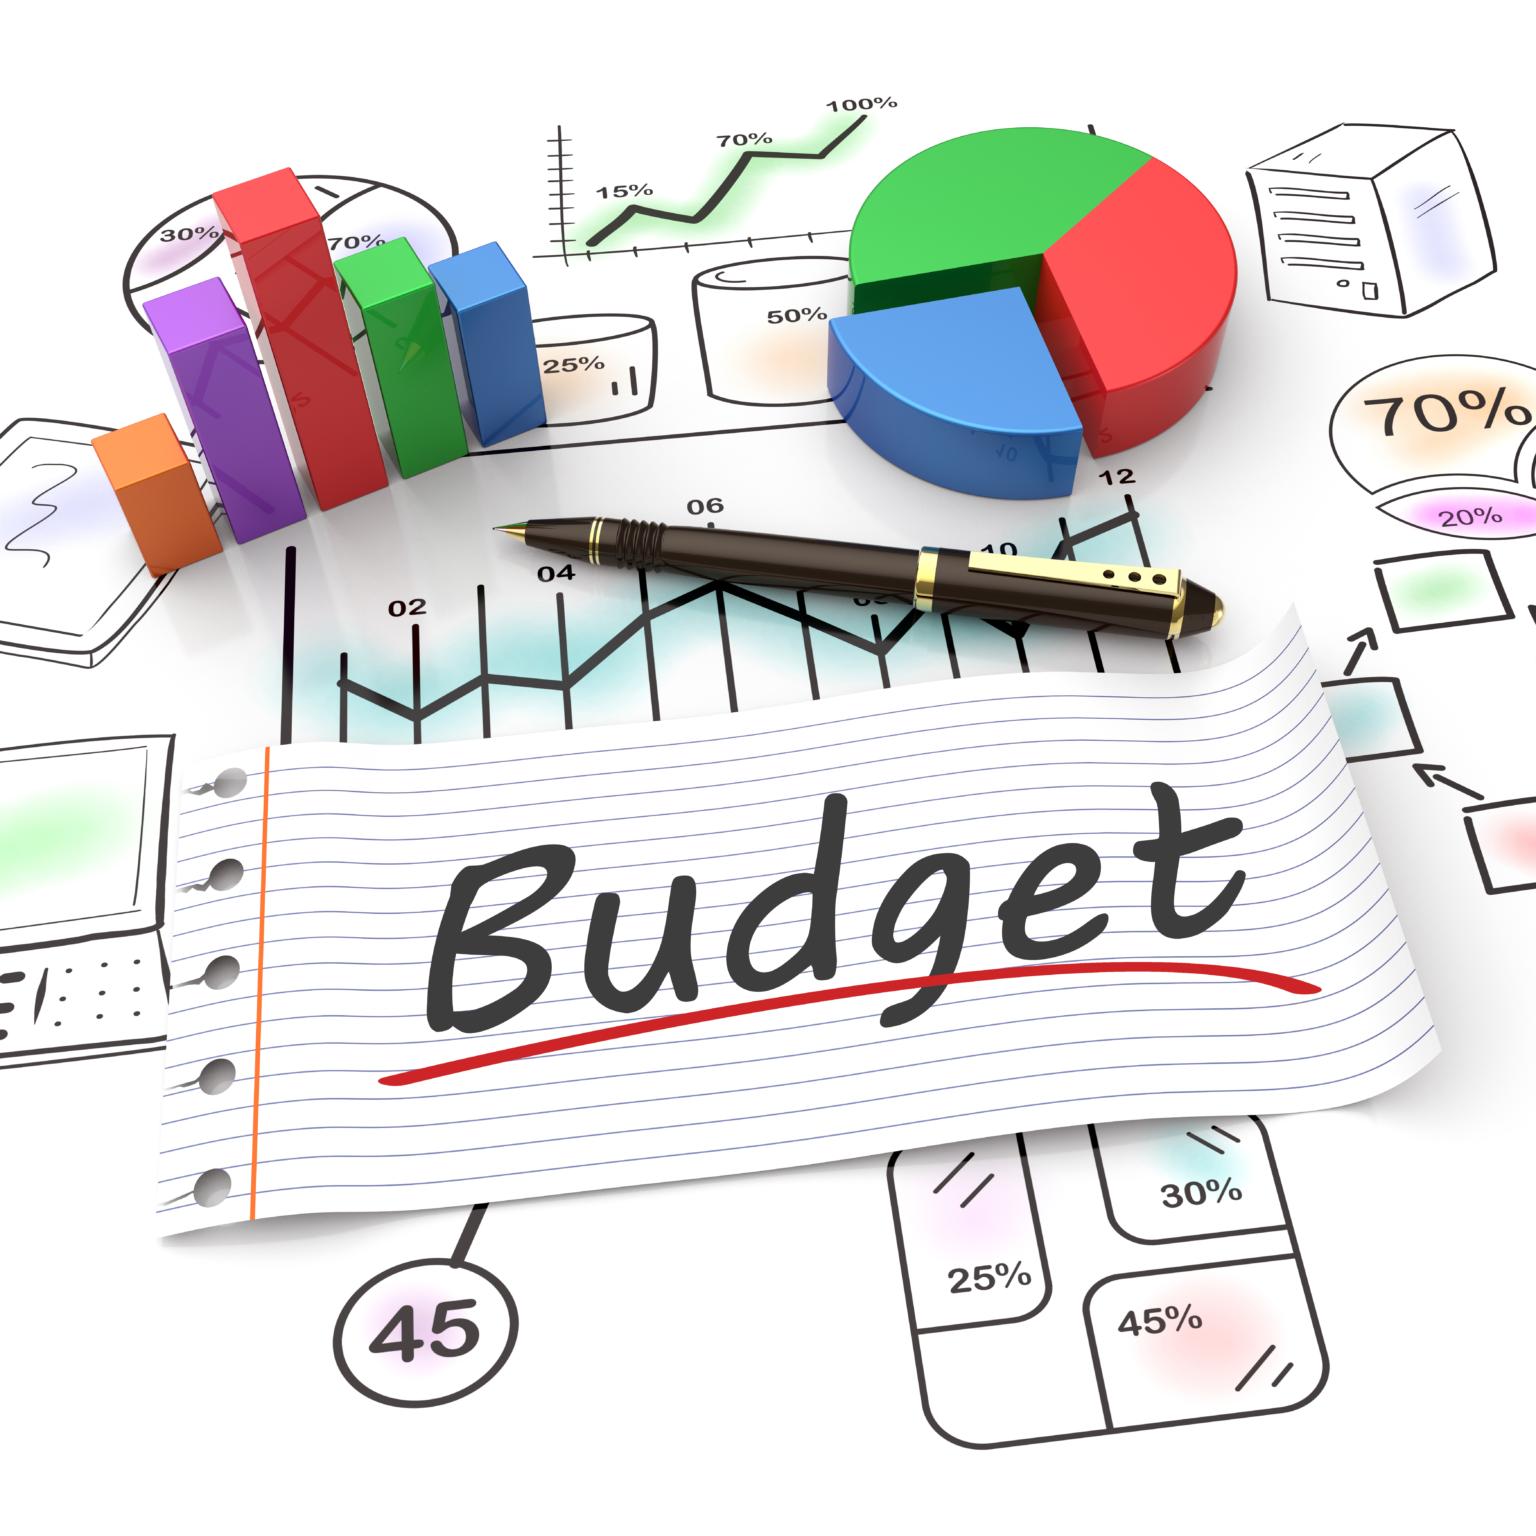 UK Budget legal advice property and inheritance tax